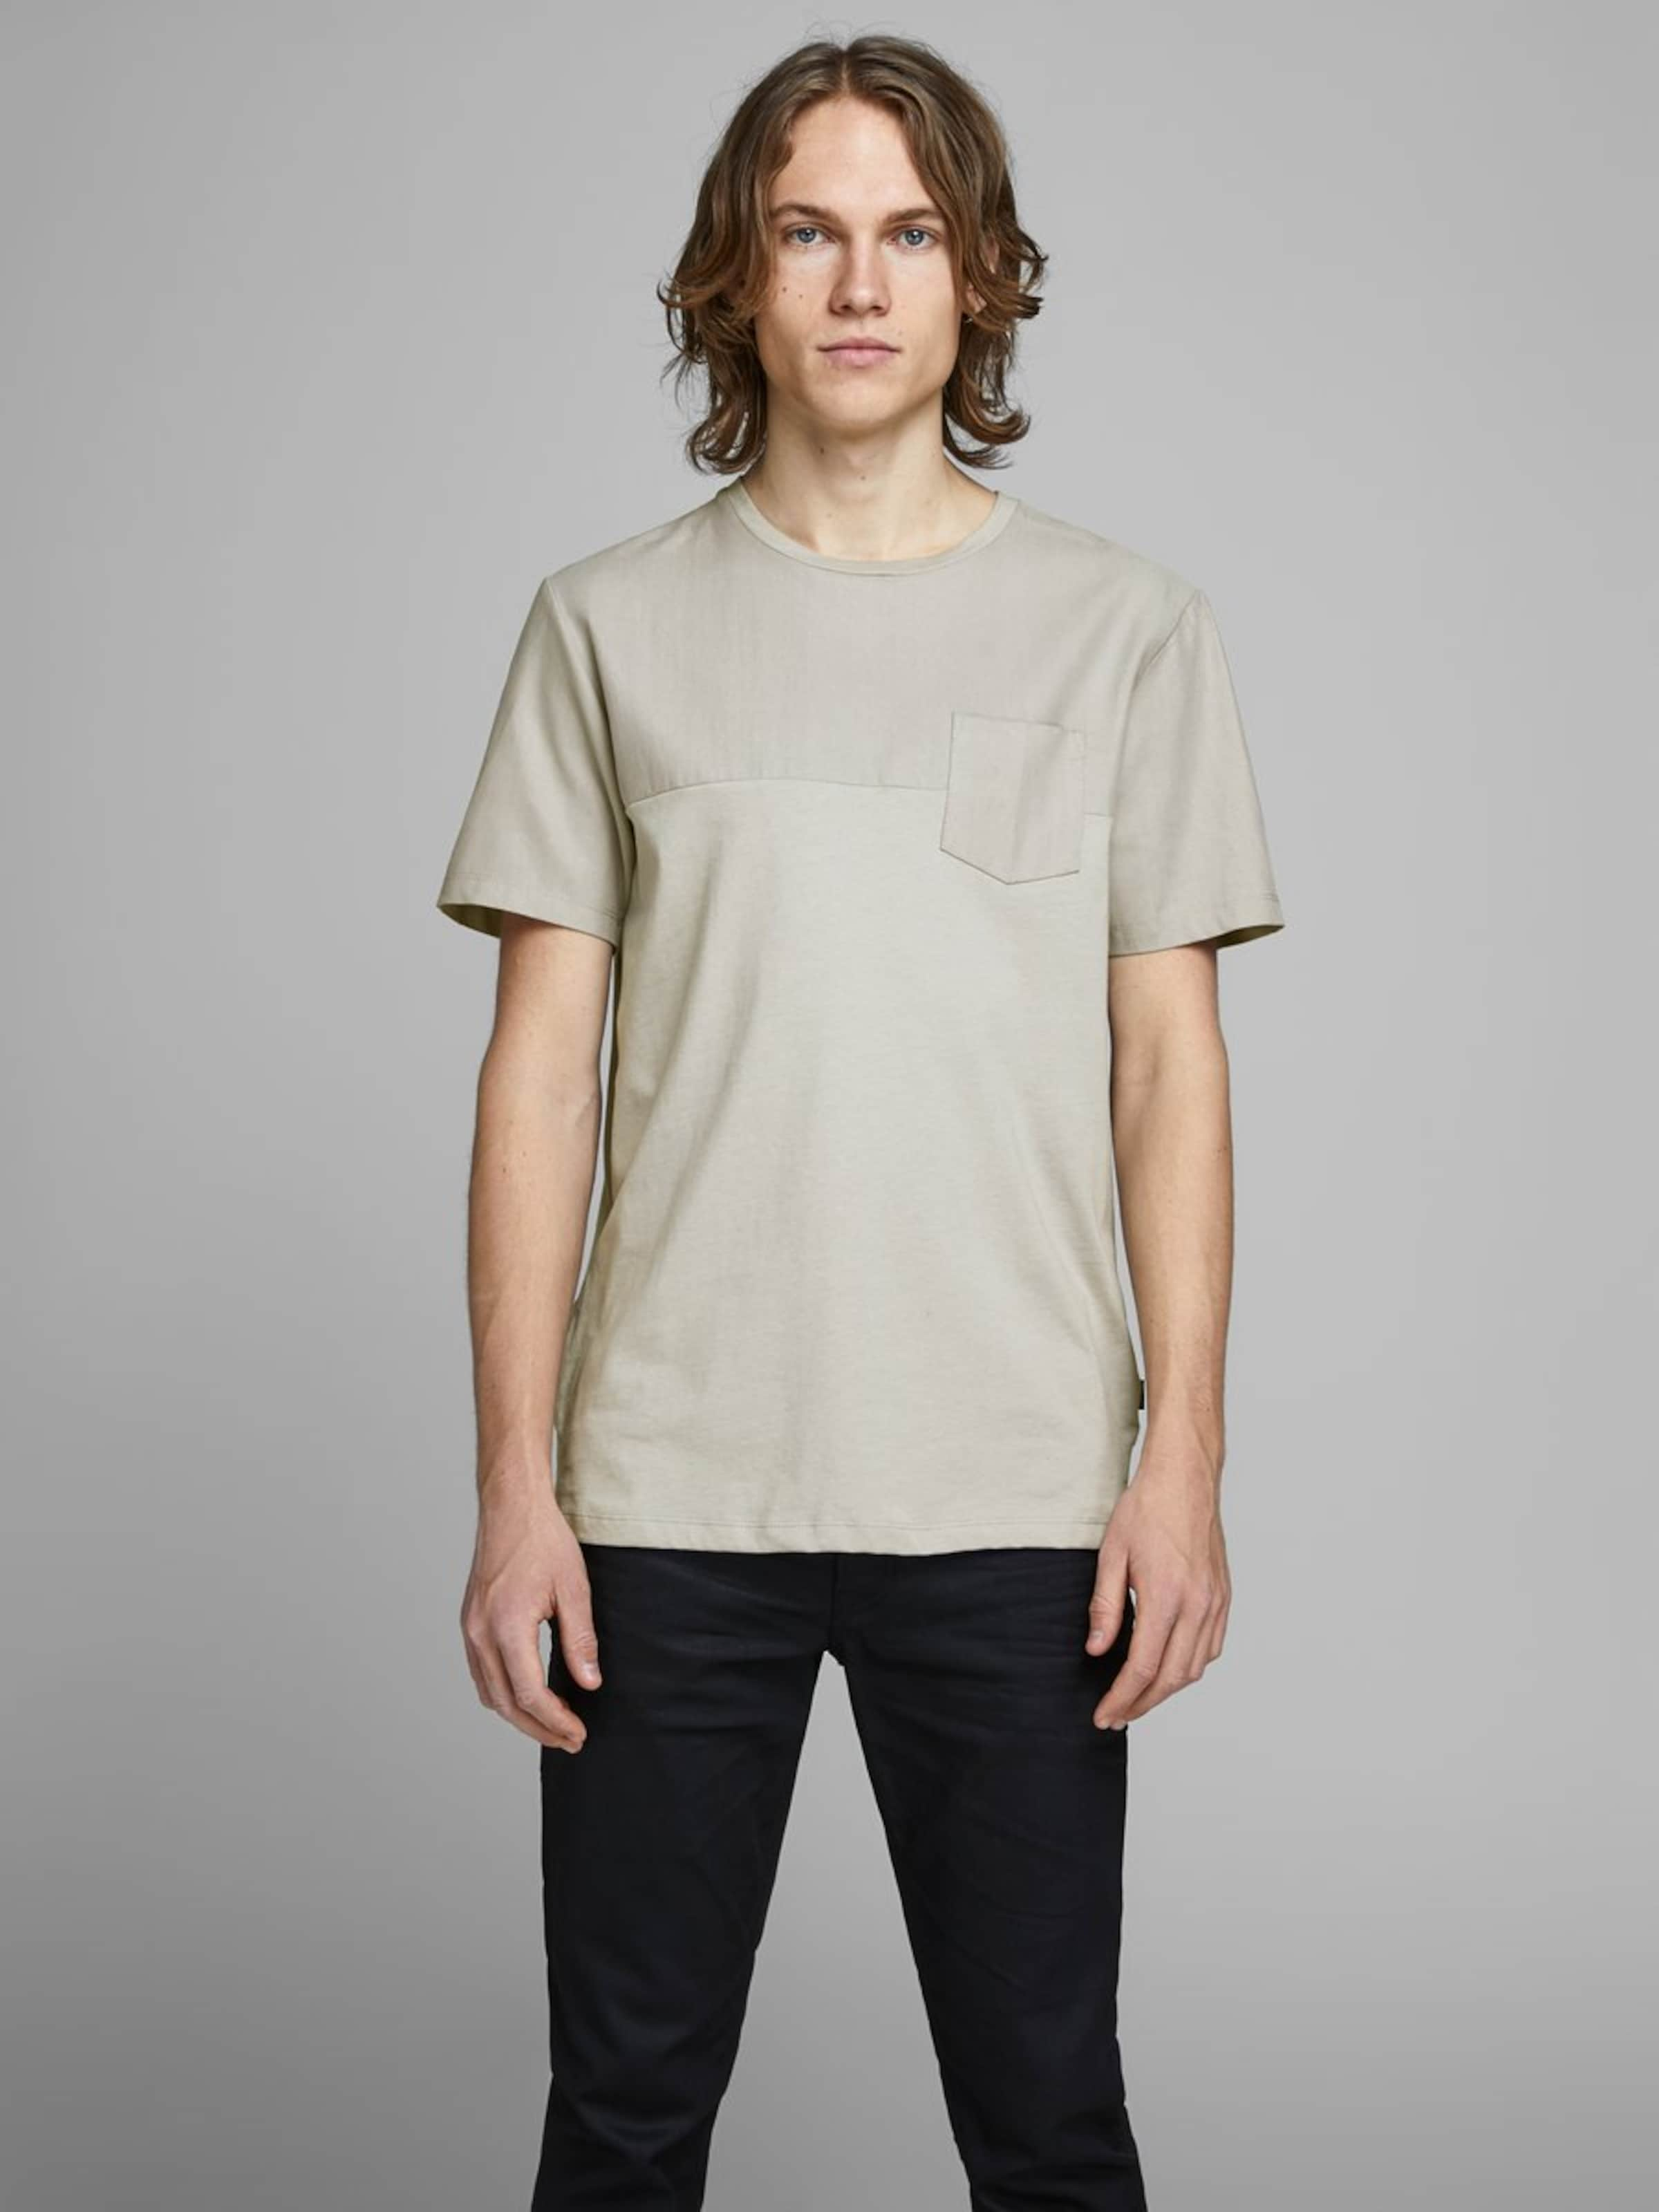 shirt In Hellgrau Jackamp; Jones T XZliuOPkwT